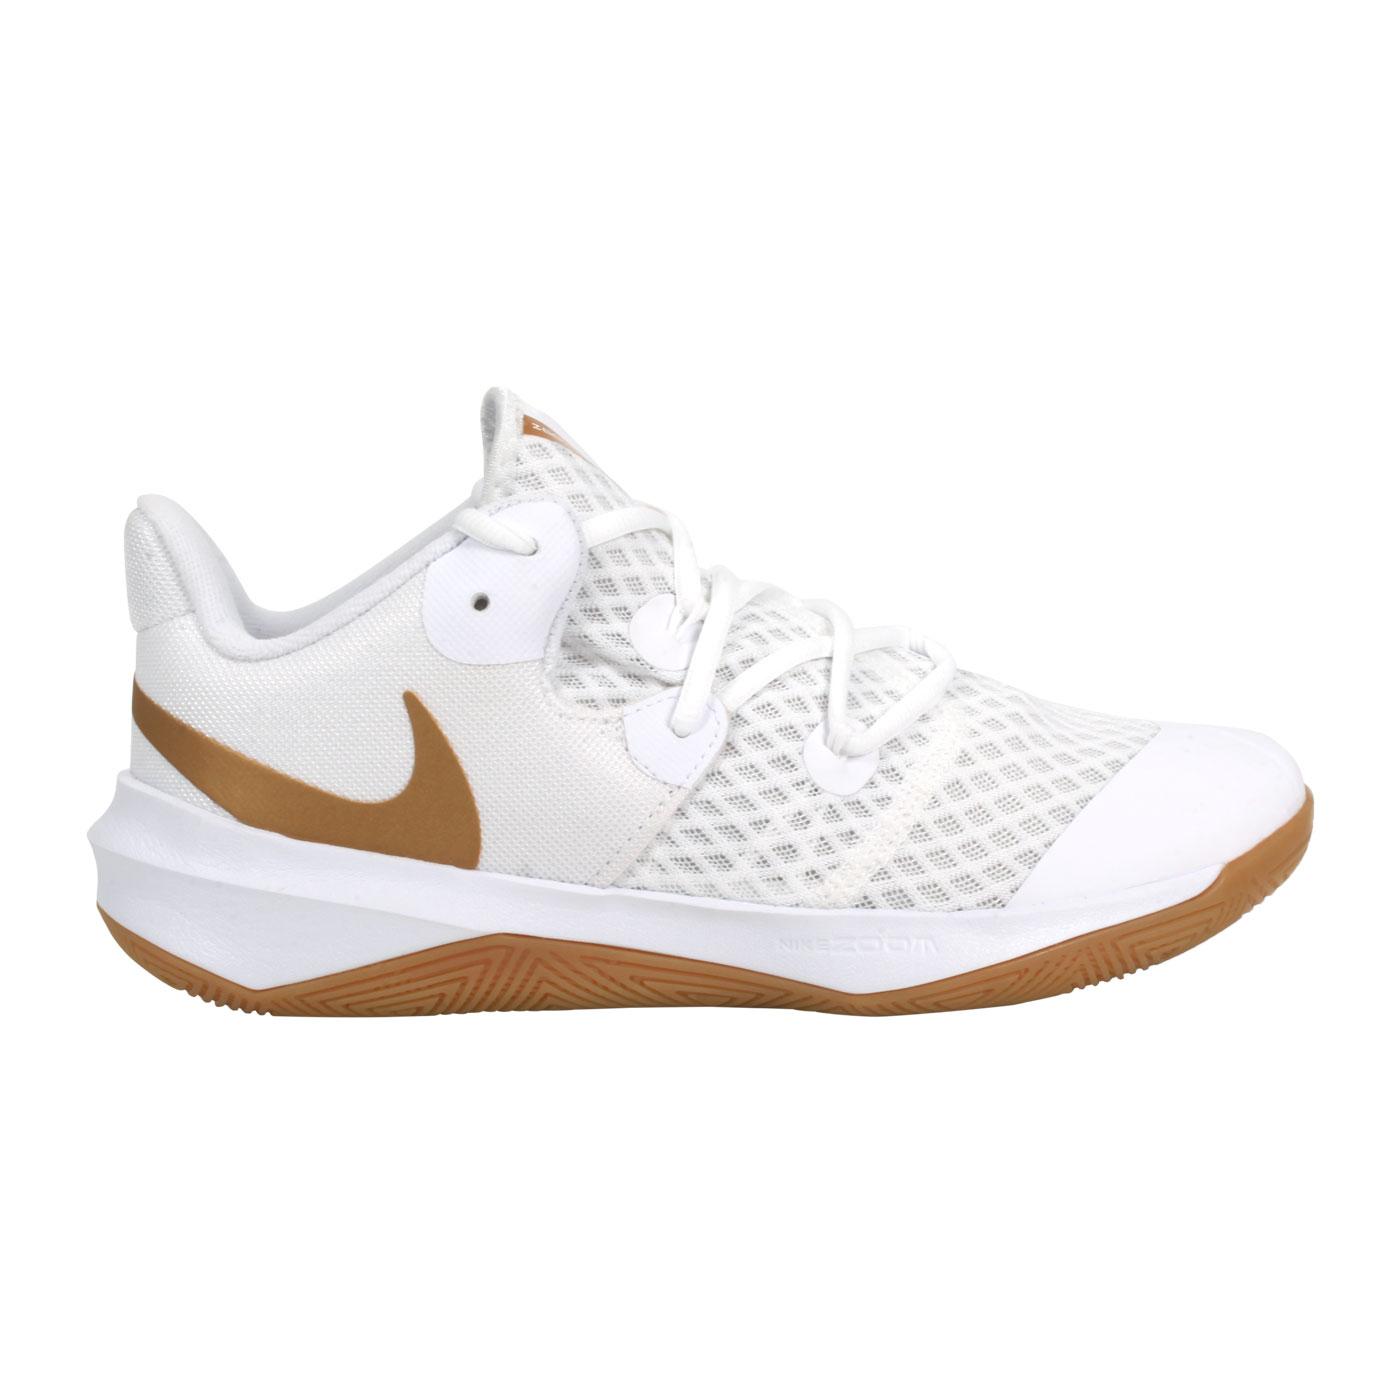 NIKE 排球鞋  @ZOOM HYPERSPEED COURT SE@DJ4476170